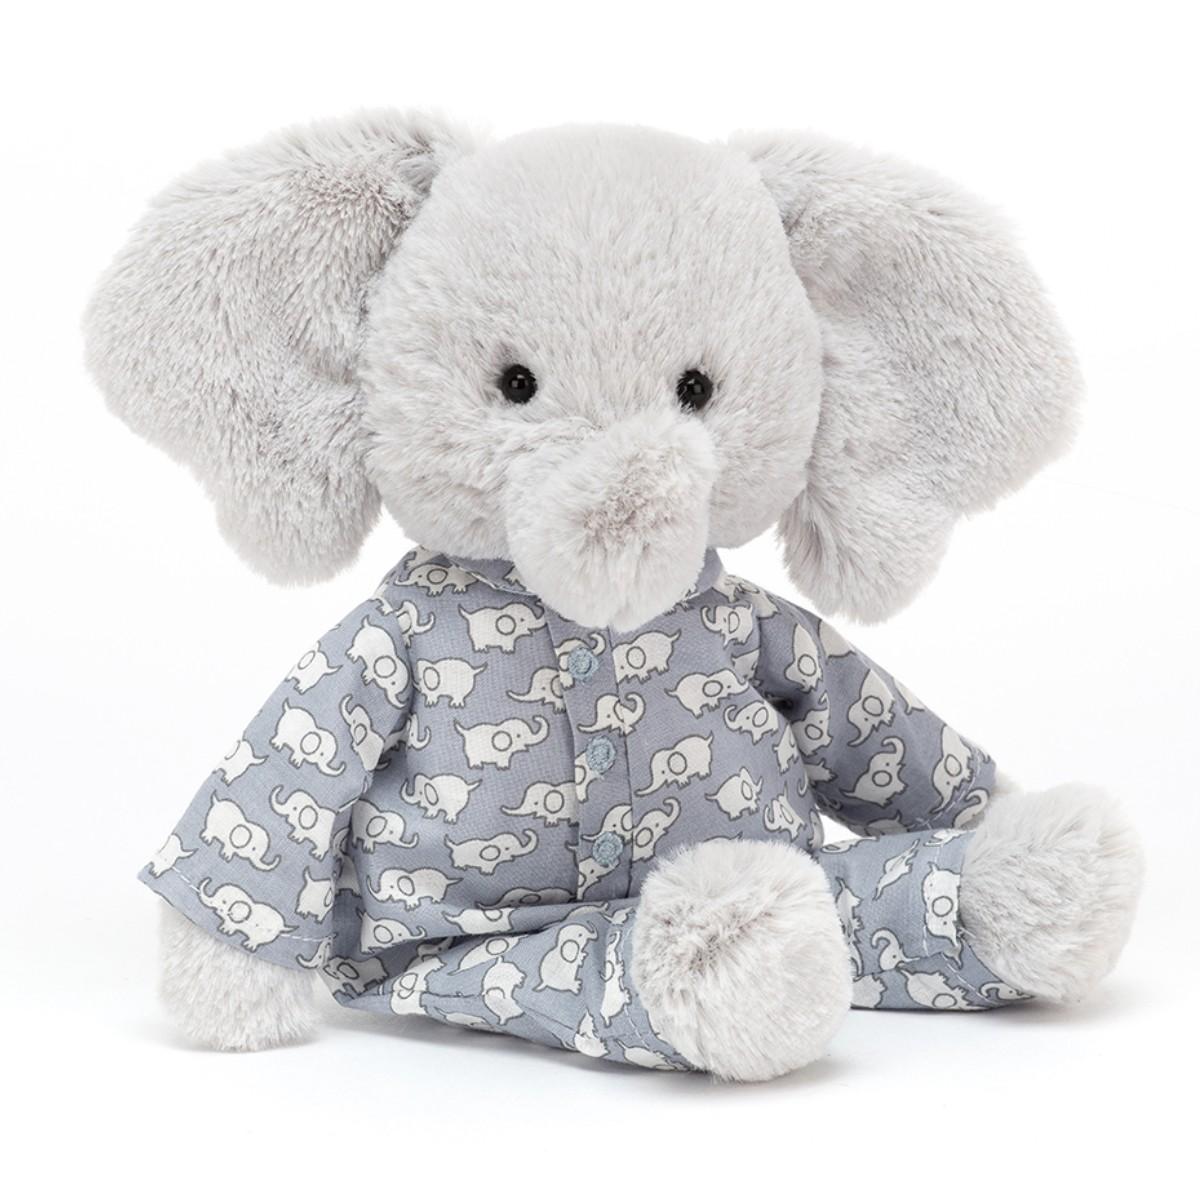 Jellycat, Bedtime elefant, 23 cm